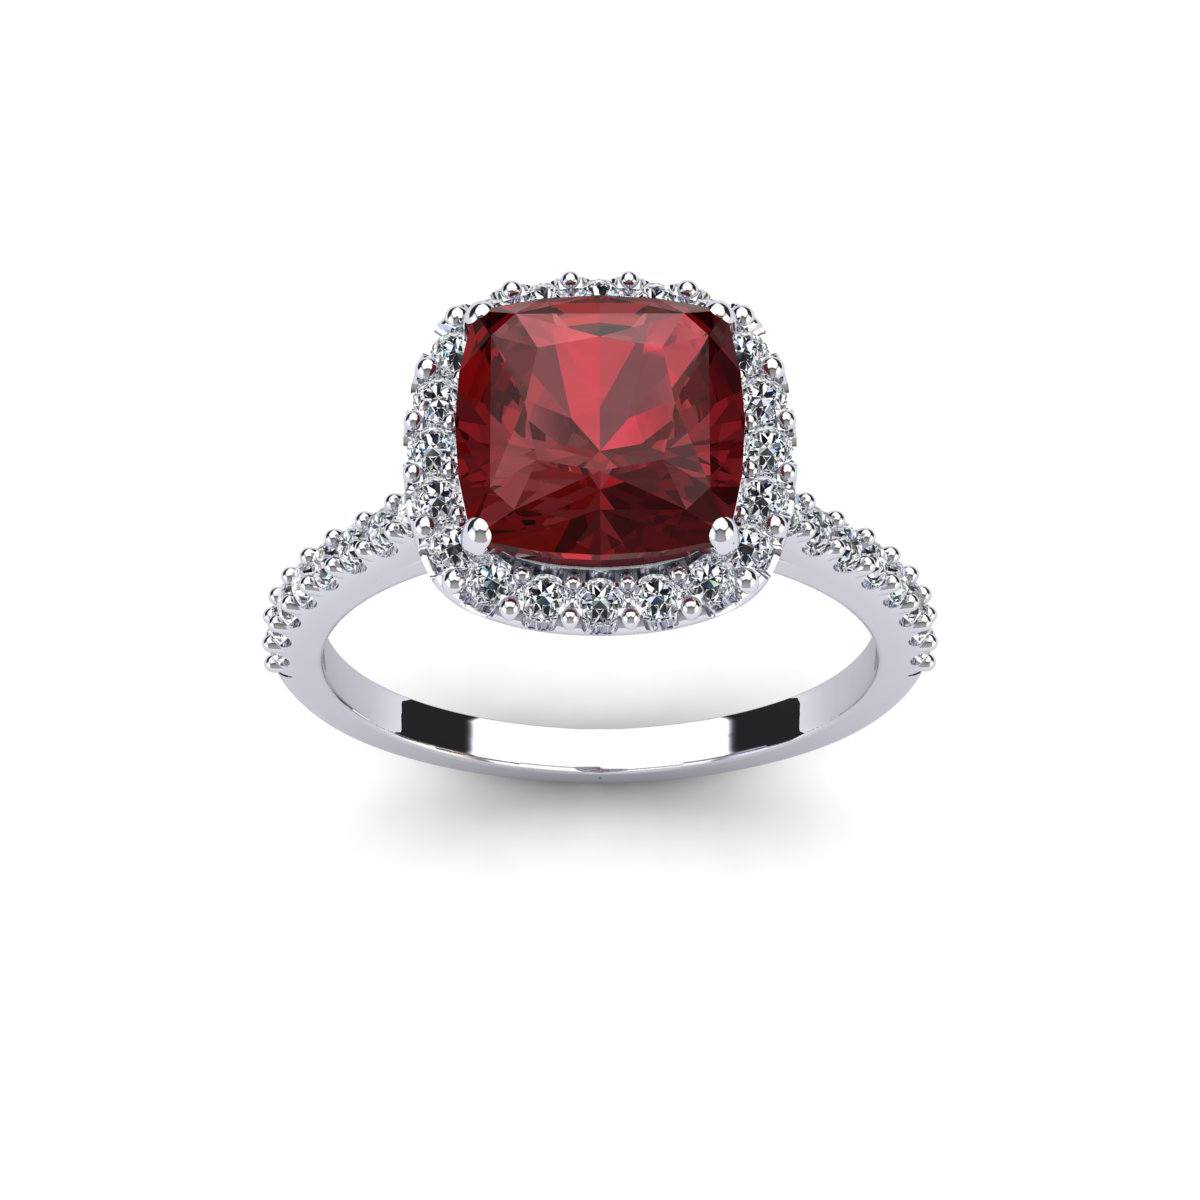 3 3/4 Carat Cushion Cut Garnet and Halo Diamond Ring In 14K White Gold